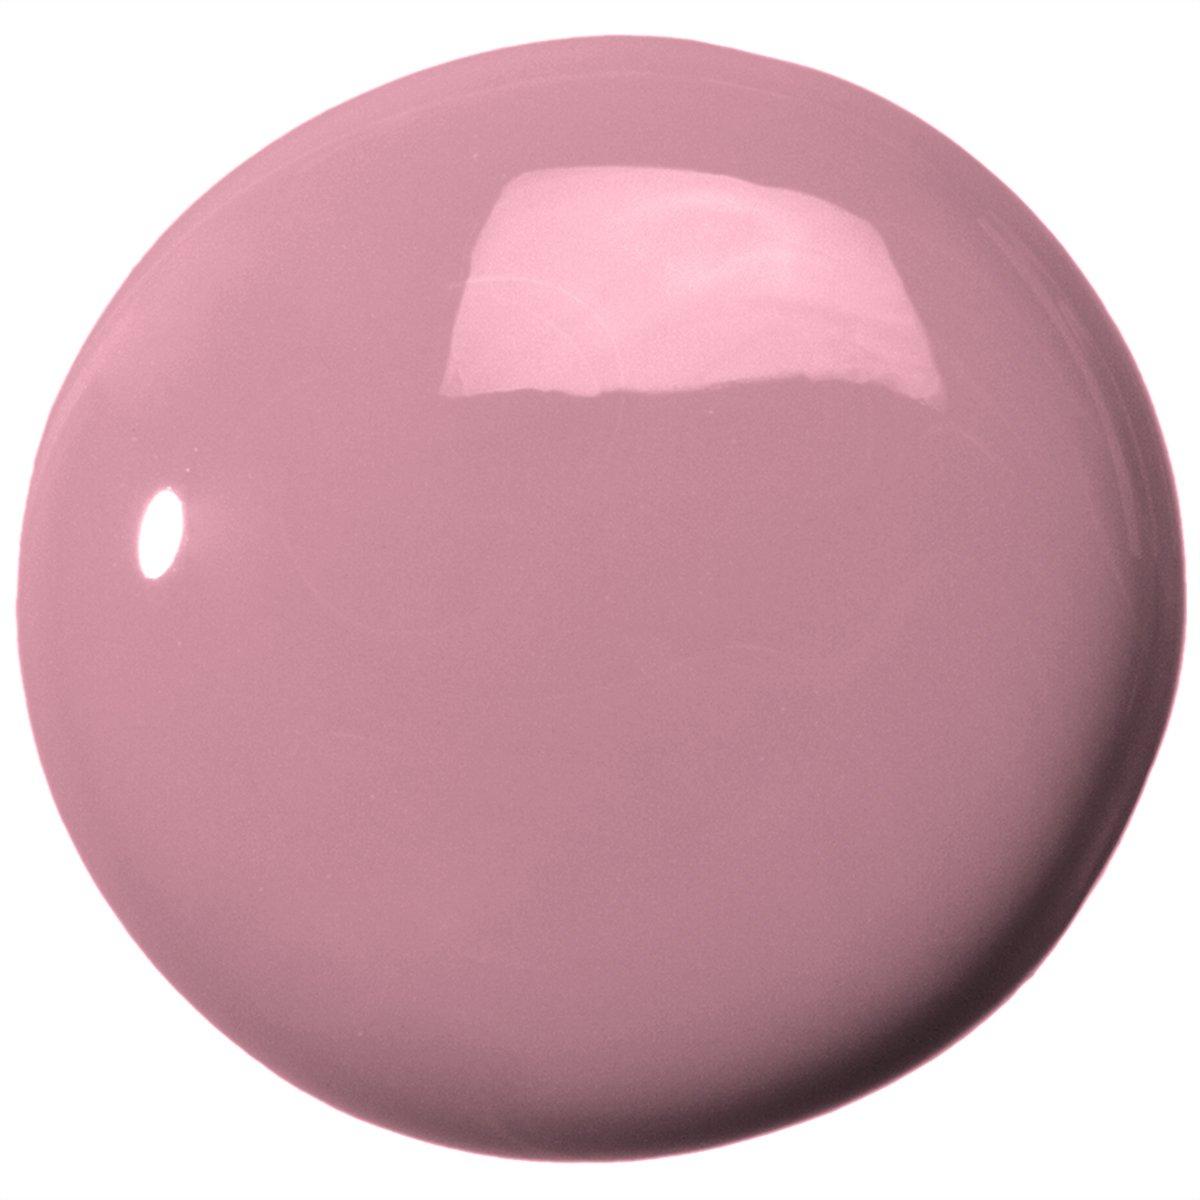 Amazon.com : essie nail polish, fiji, pink nail polish, 0.46 fl. oz ...